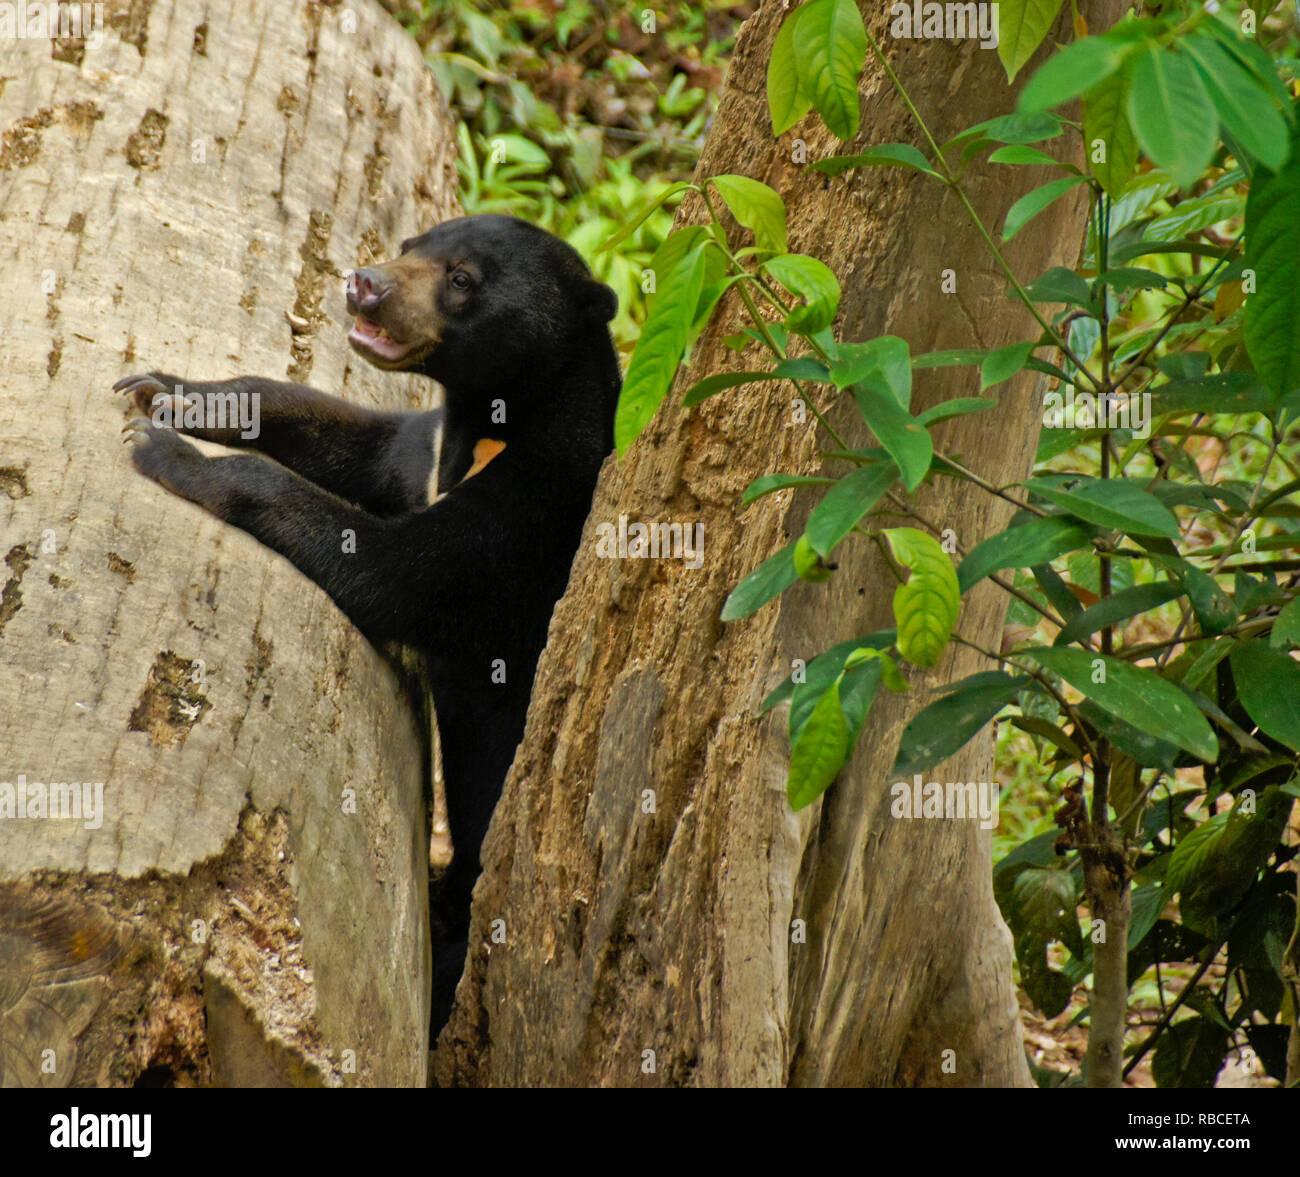 Malayan sun bear Klettern auf Baum an Bornesischen Sun Bear Conservation Centre, Sandakan, Sabah (Borneo), Malaysia Stockfoto